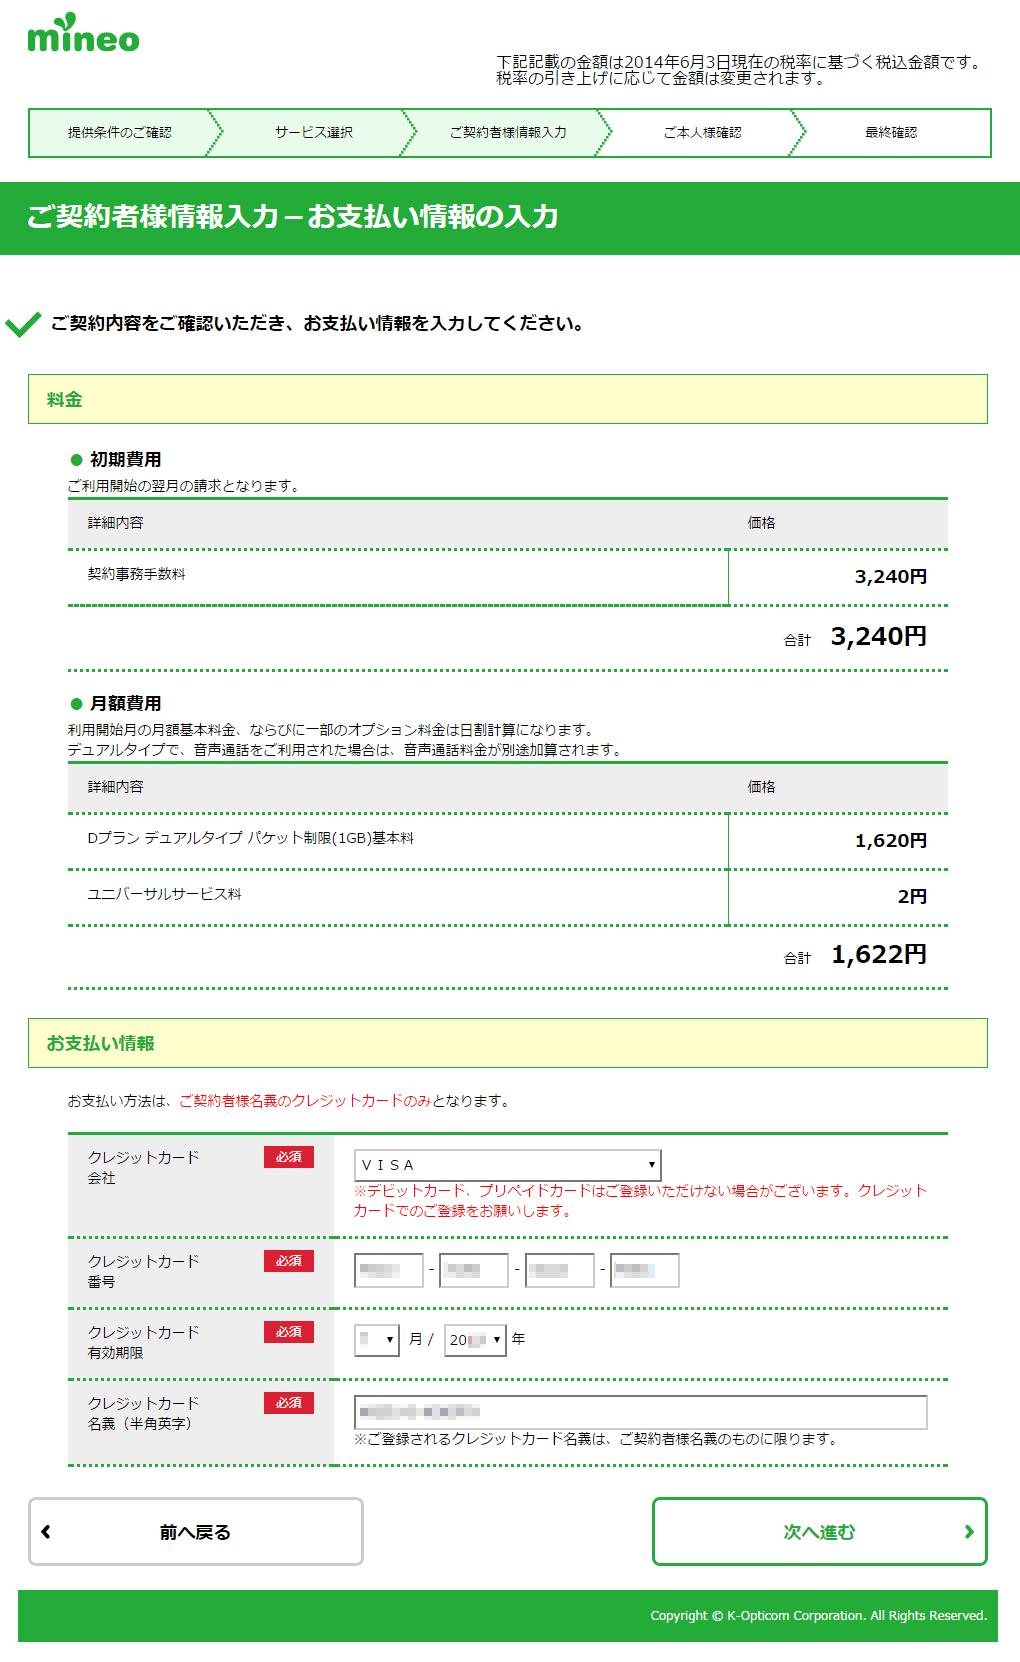 mineo申し込み方法 支払い情報の入力